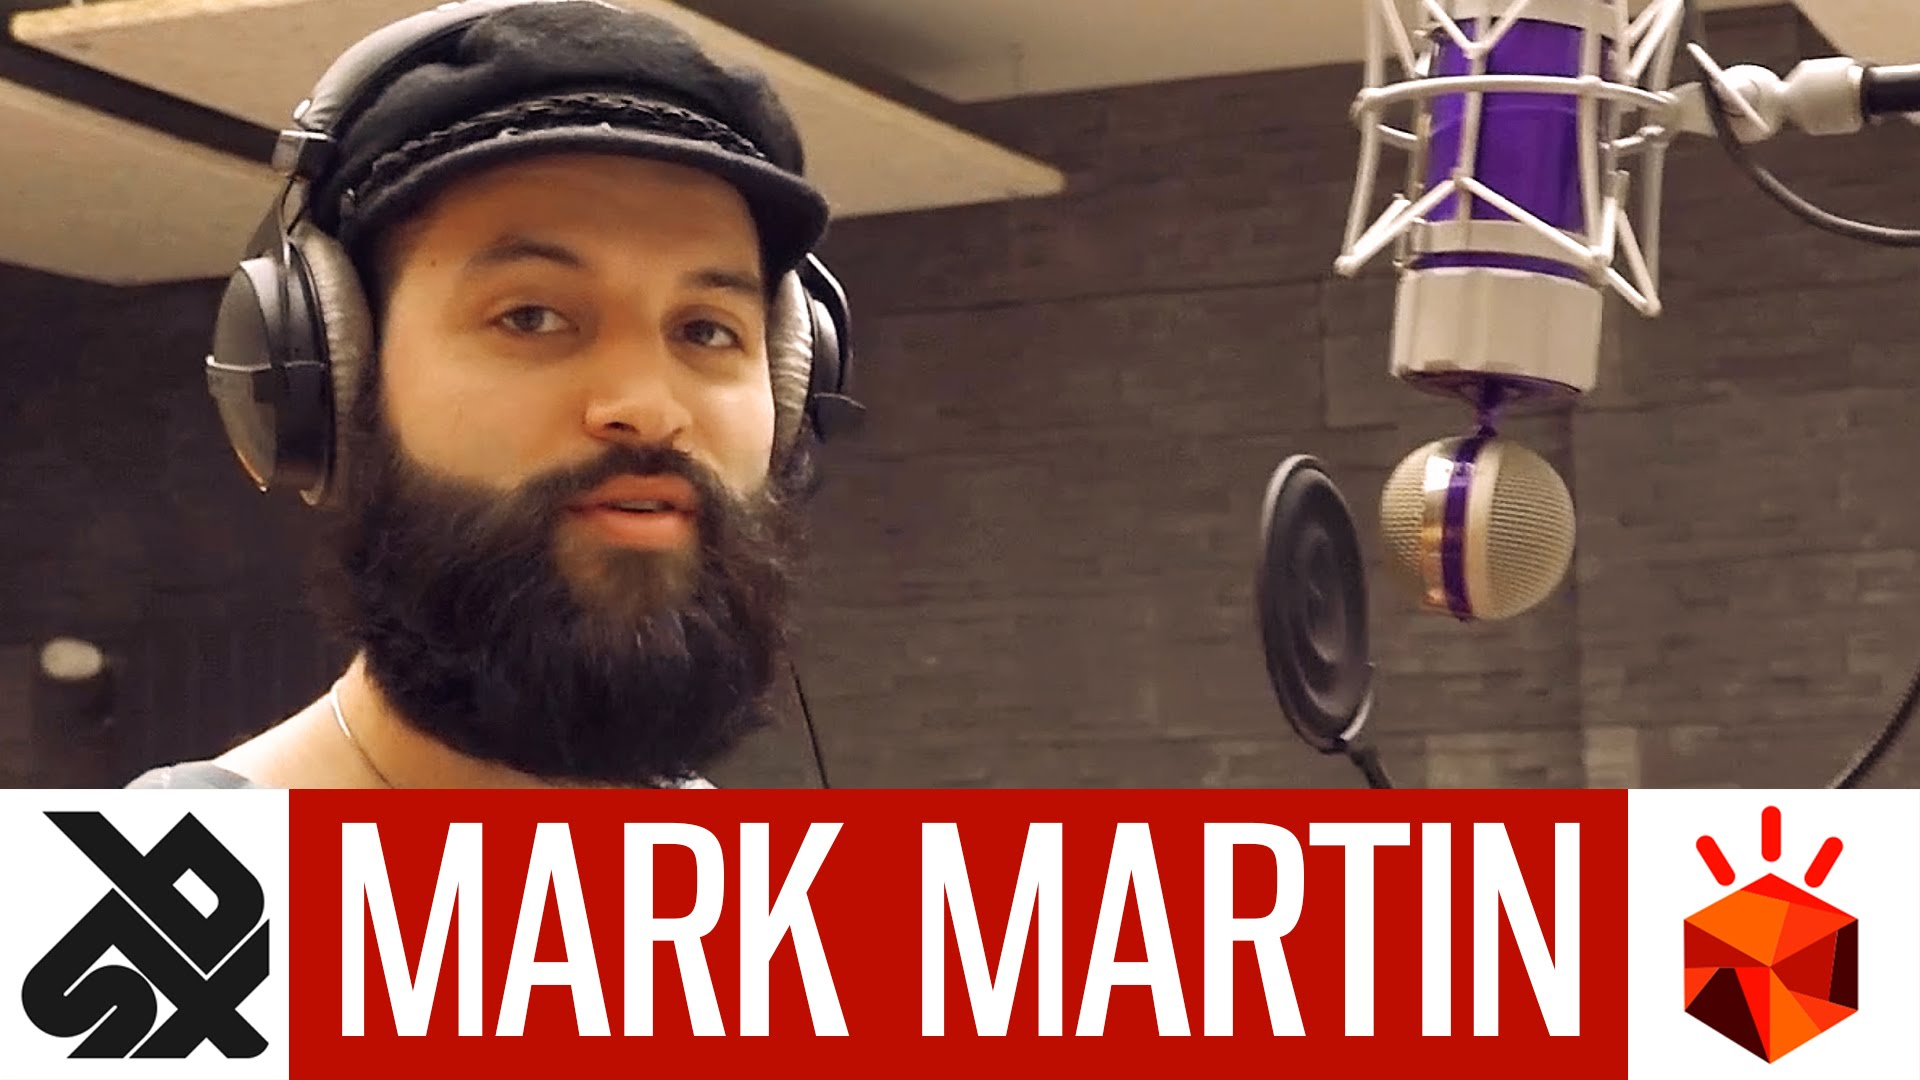 Mark Martin   https://markmartincreative.com/